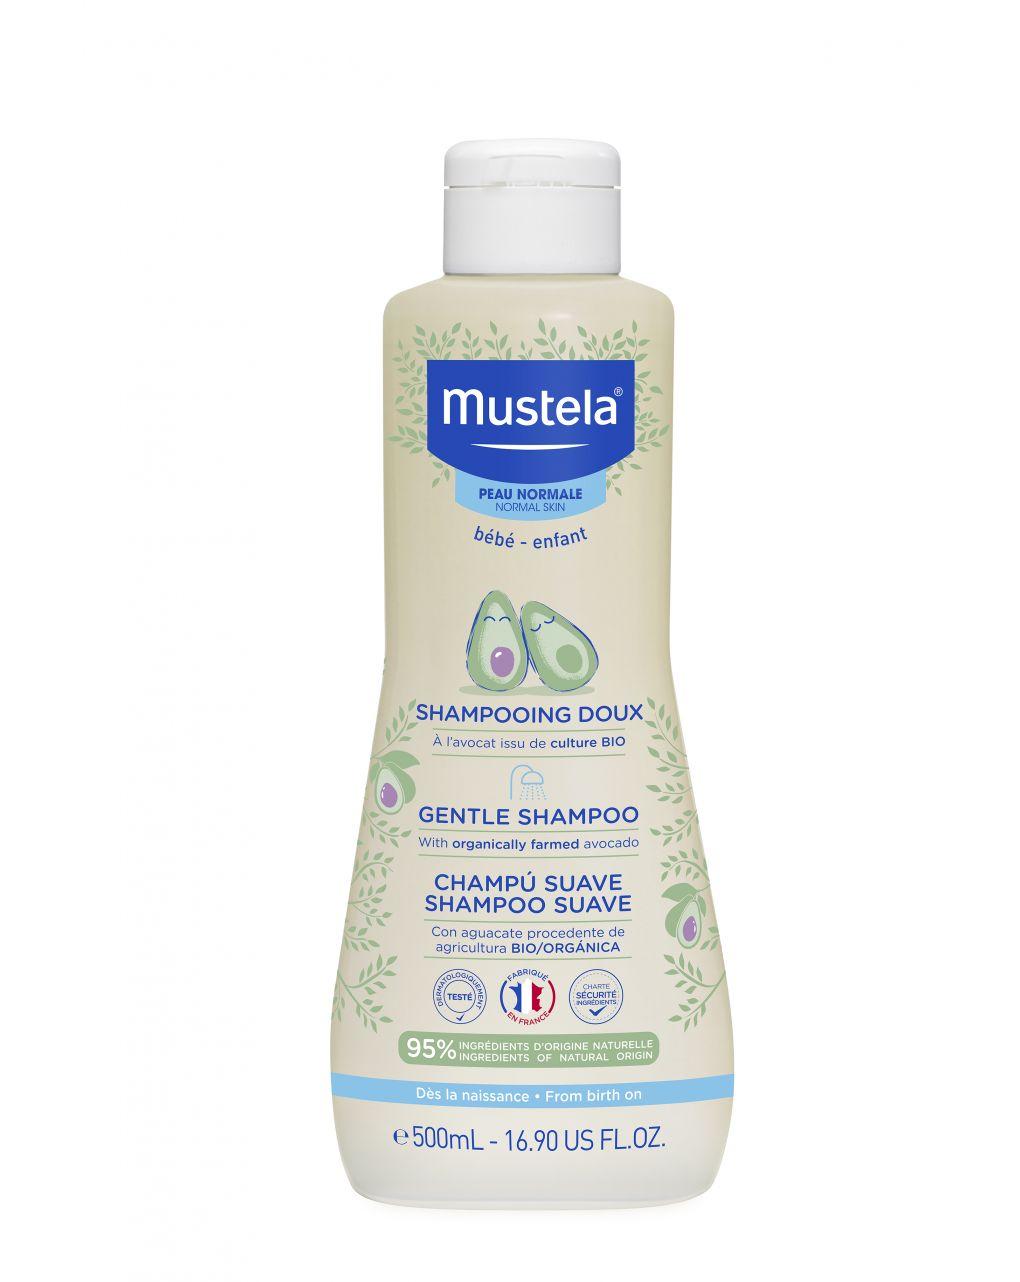 Shampoo dolce 500ml - Mustela